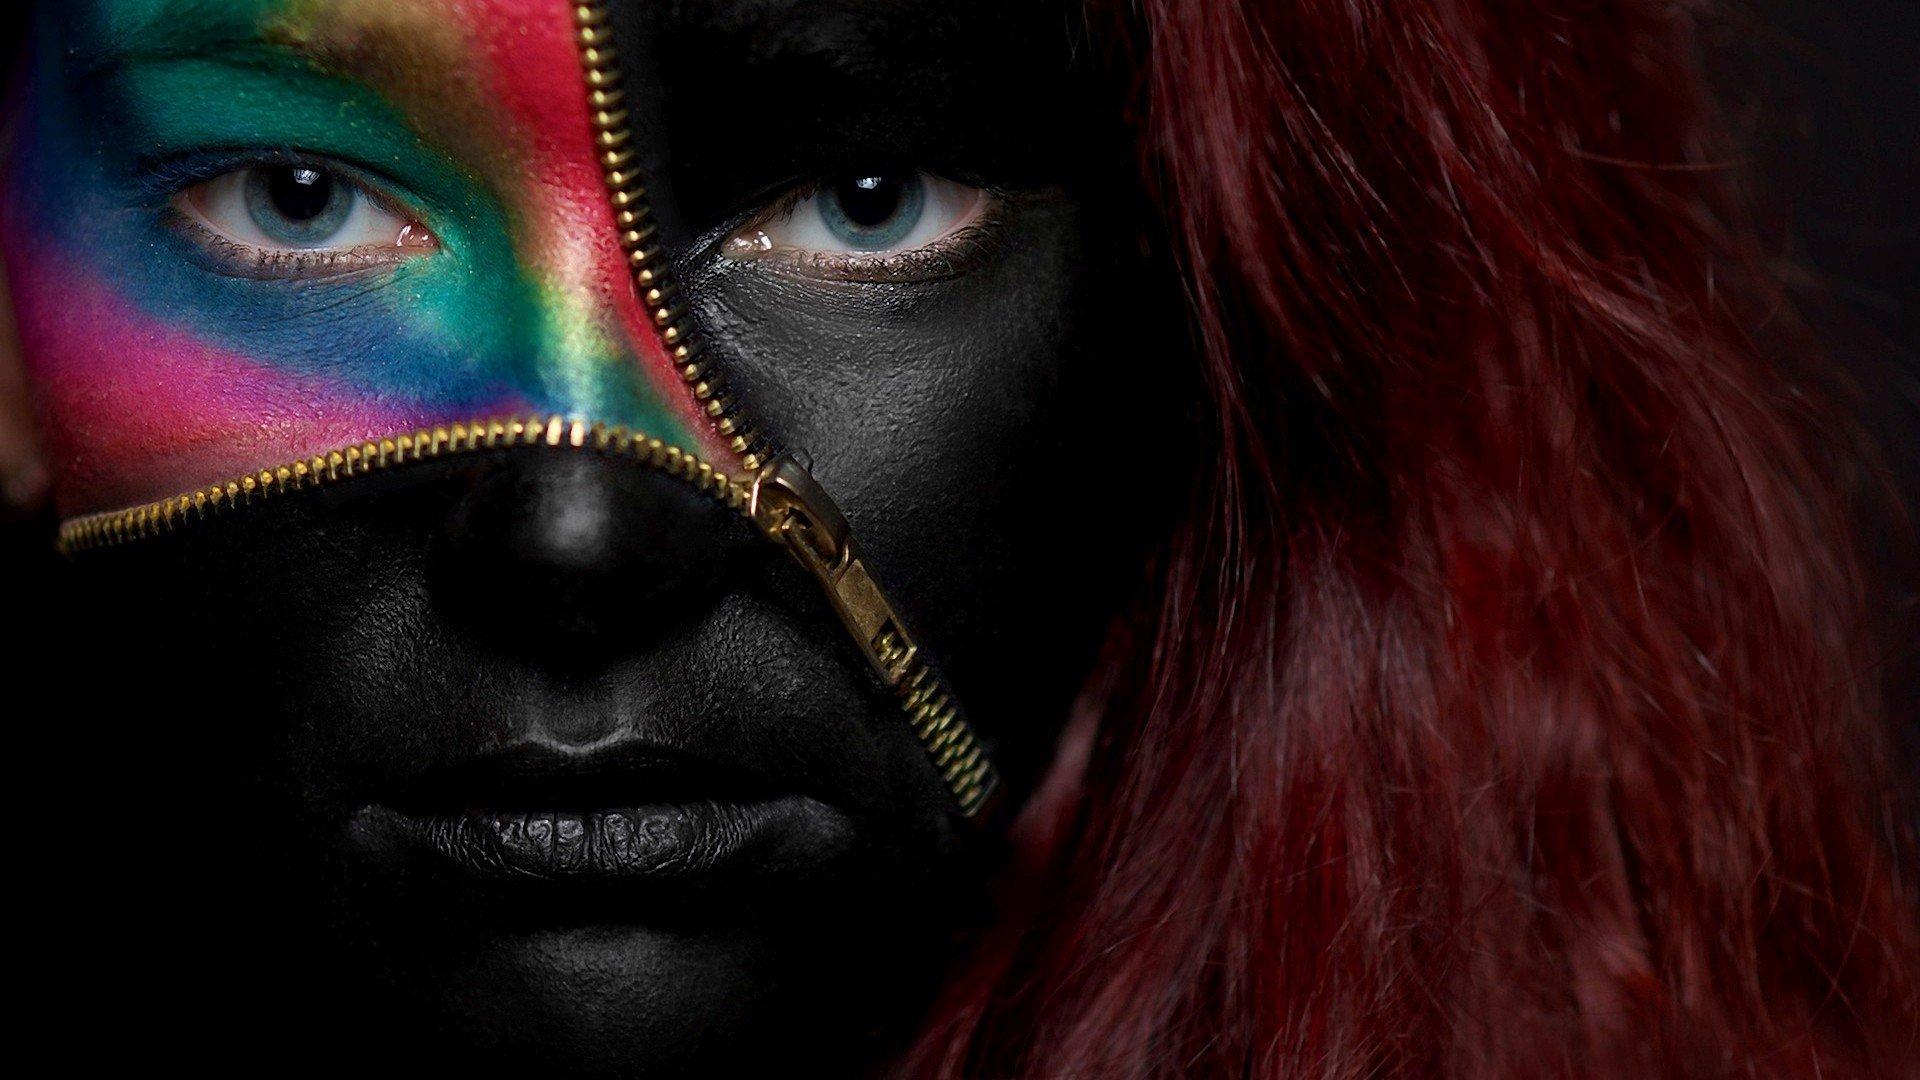 Face, Model, Long Hair, Portrait, Artwork, Body Paint -8802